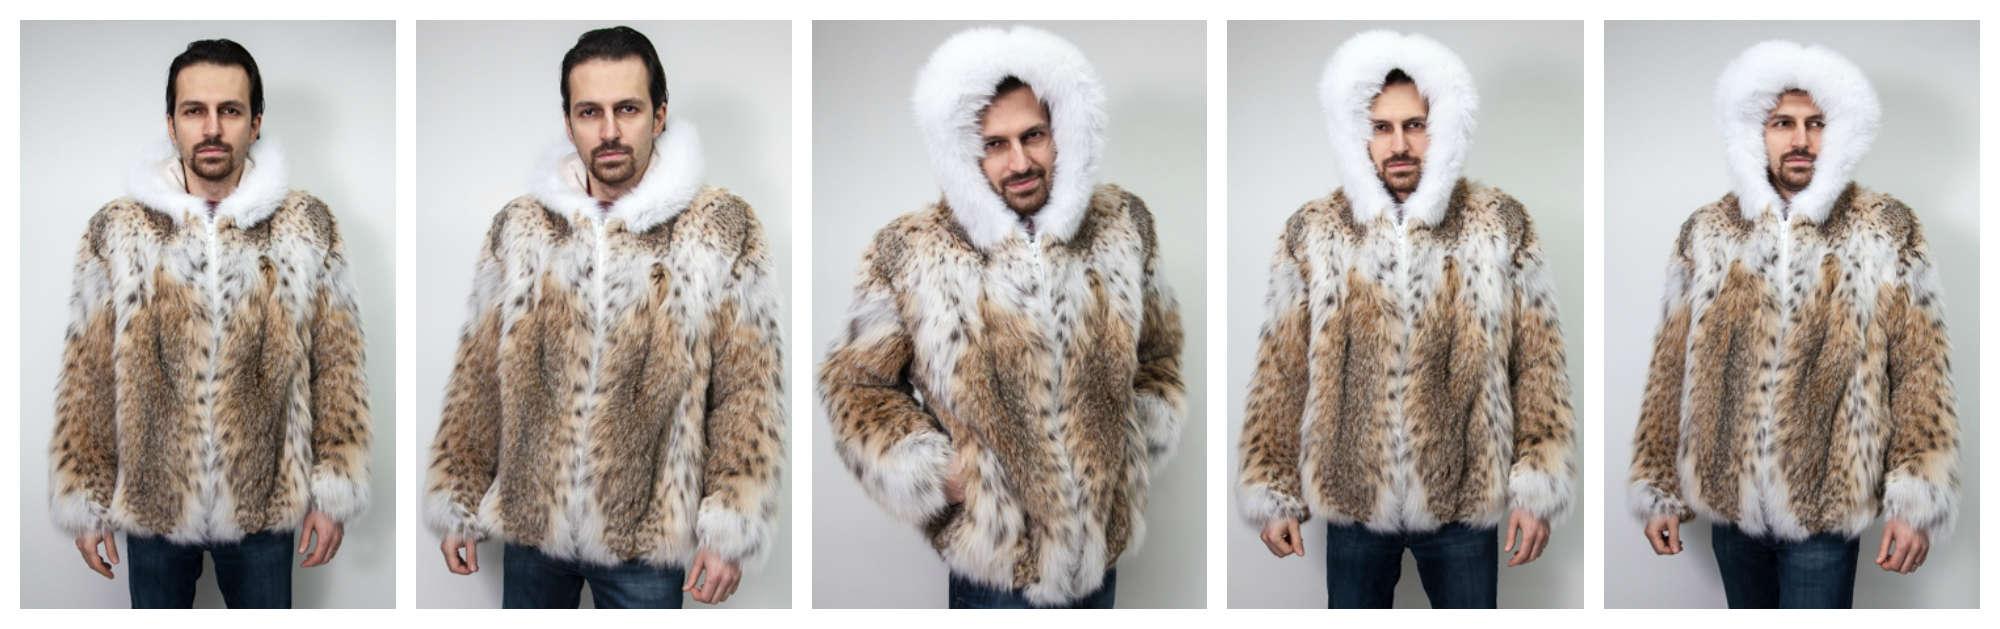 The Lynx Fur Jacket with White Fox Hood worn by Snoop Dogg AKA Snoop Lion